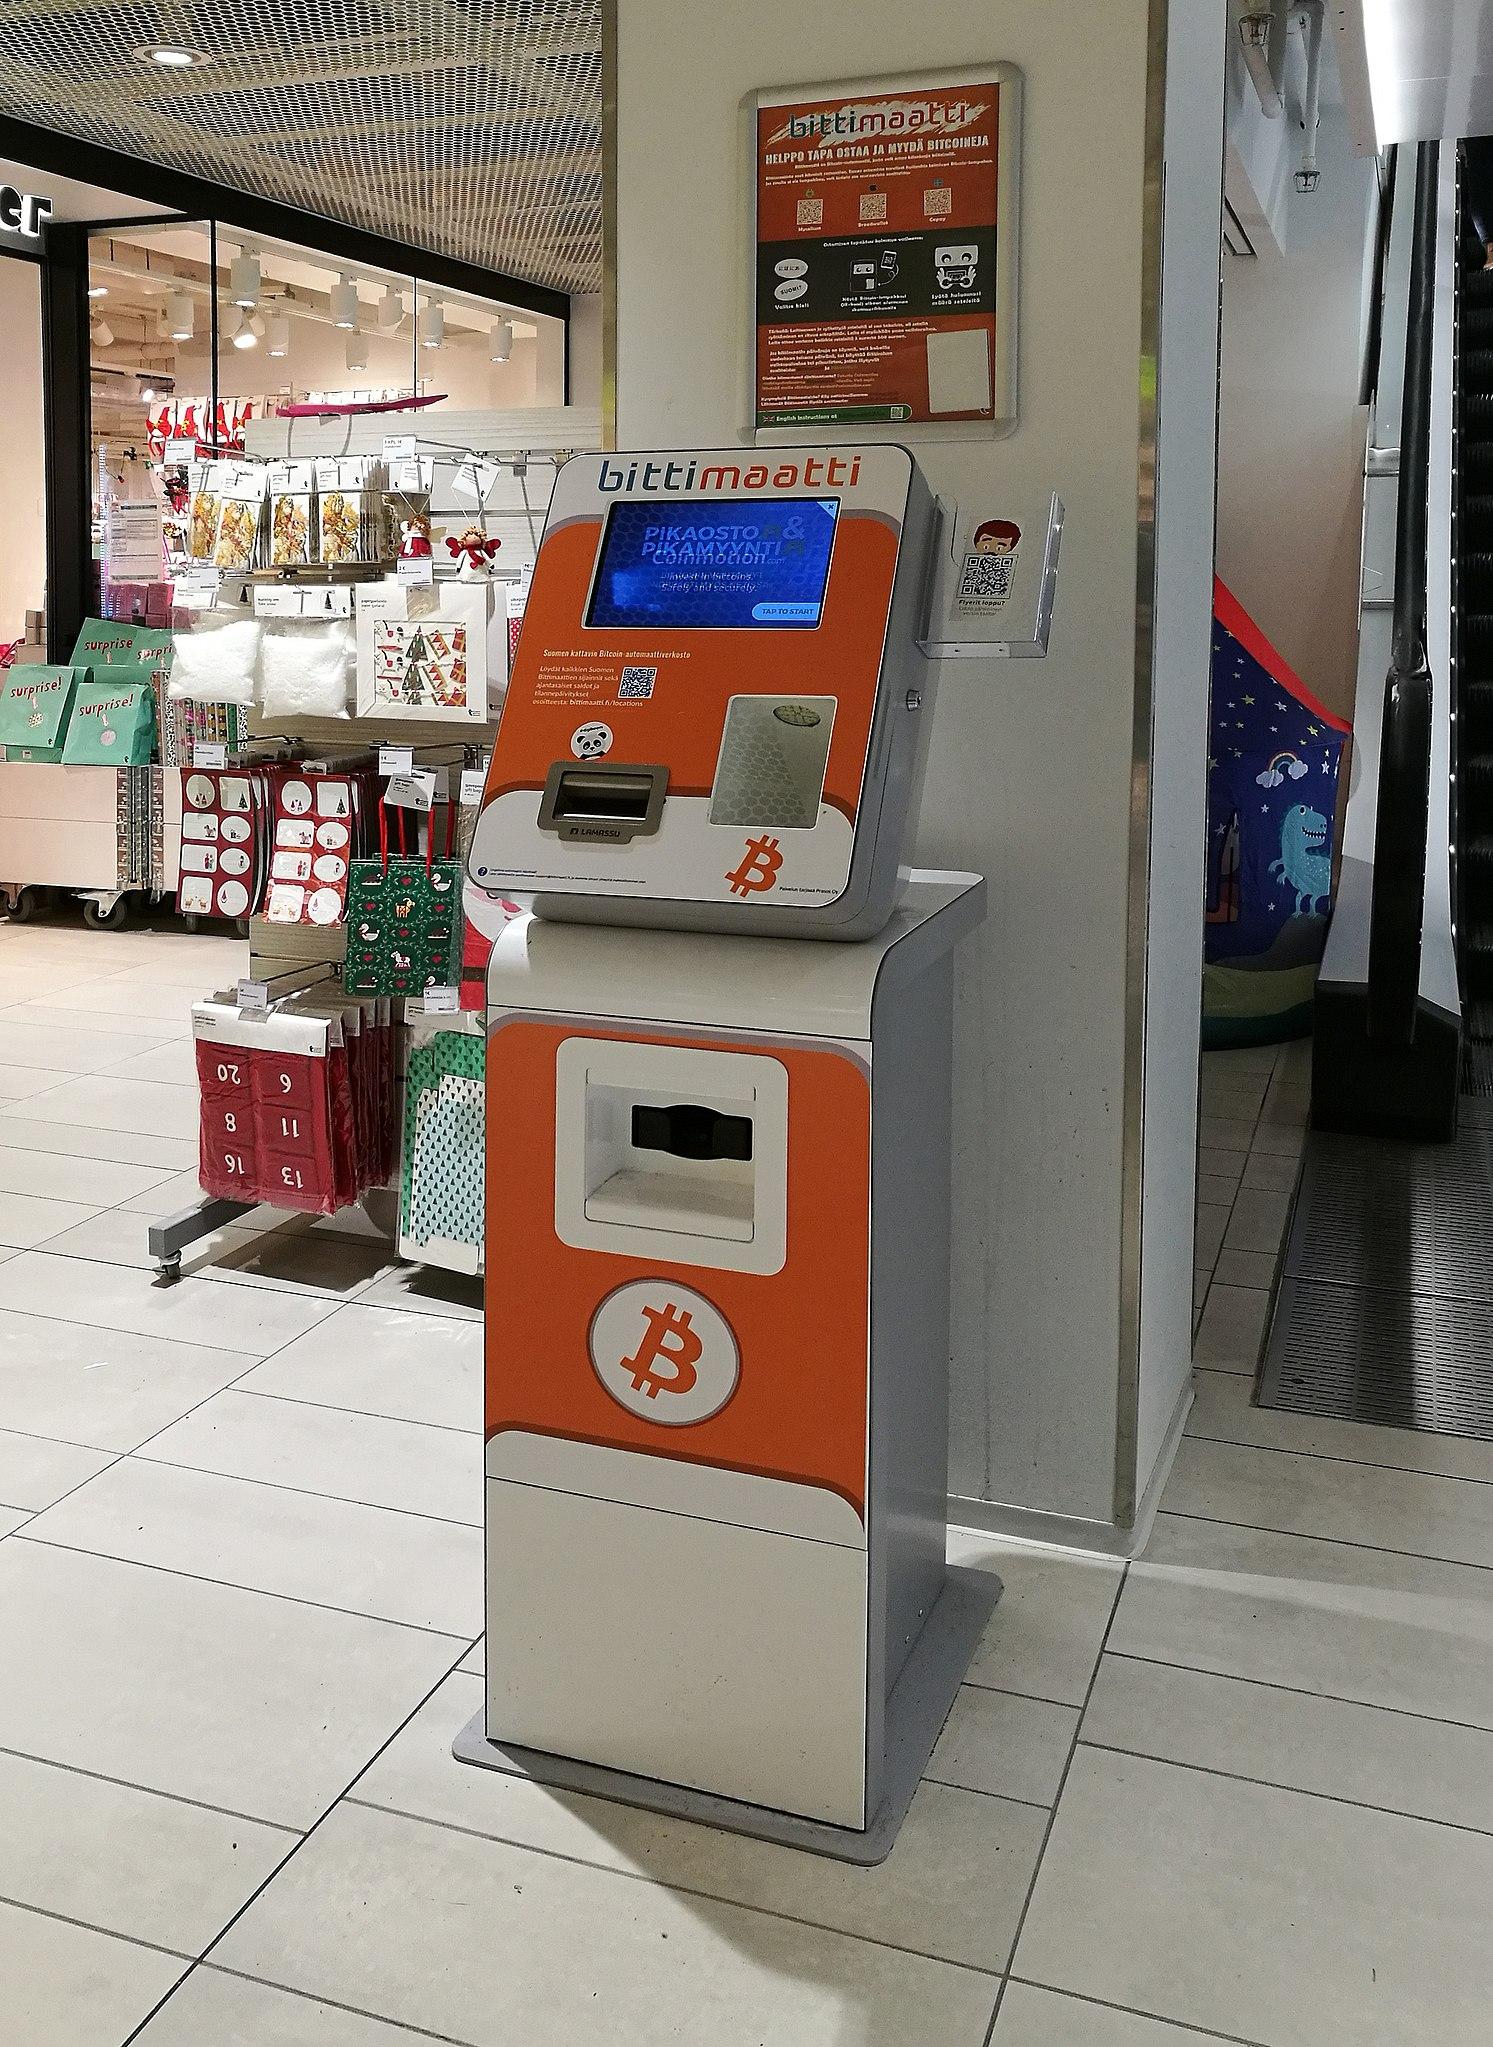 Bitcoin 2-way ATM, Helsinkis — Kellosaarenranta